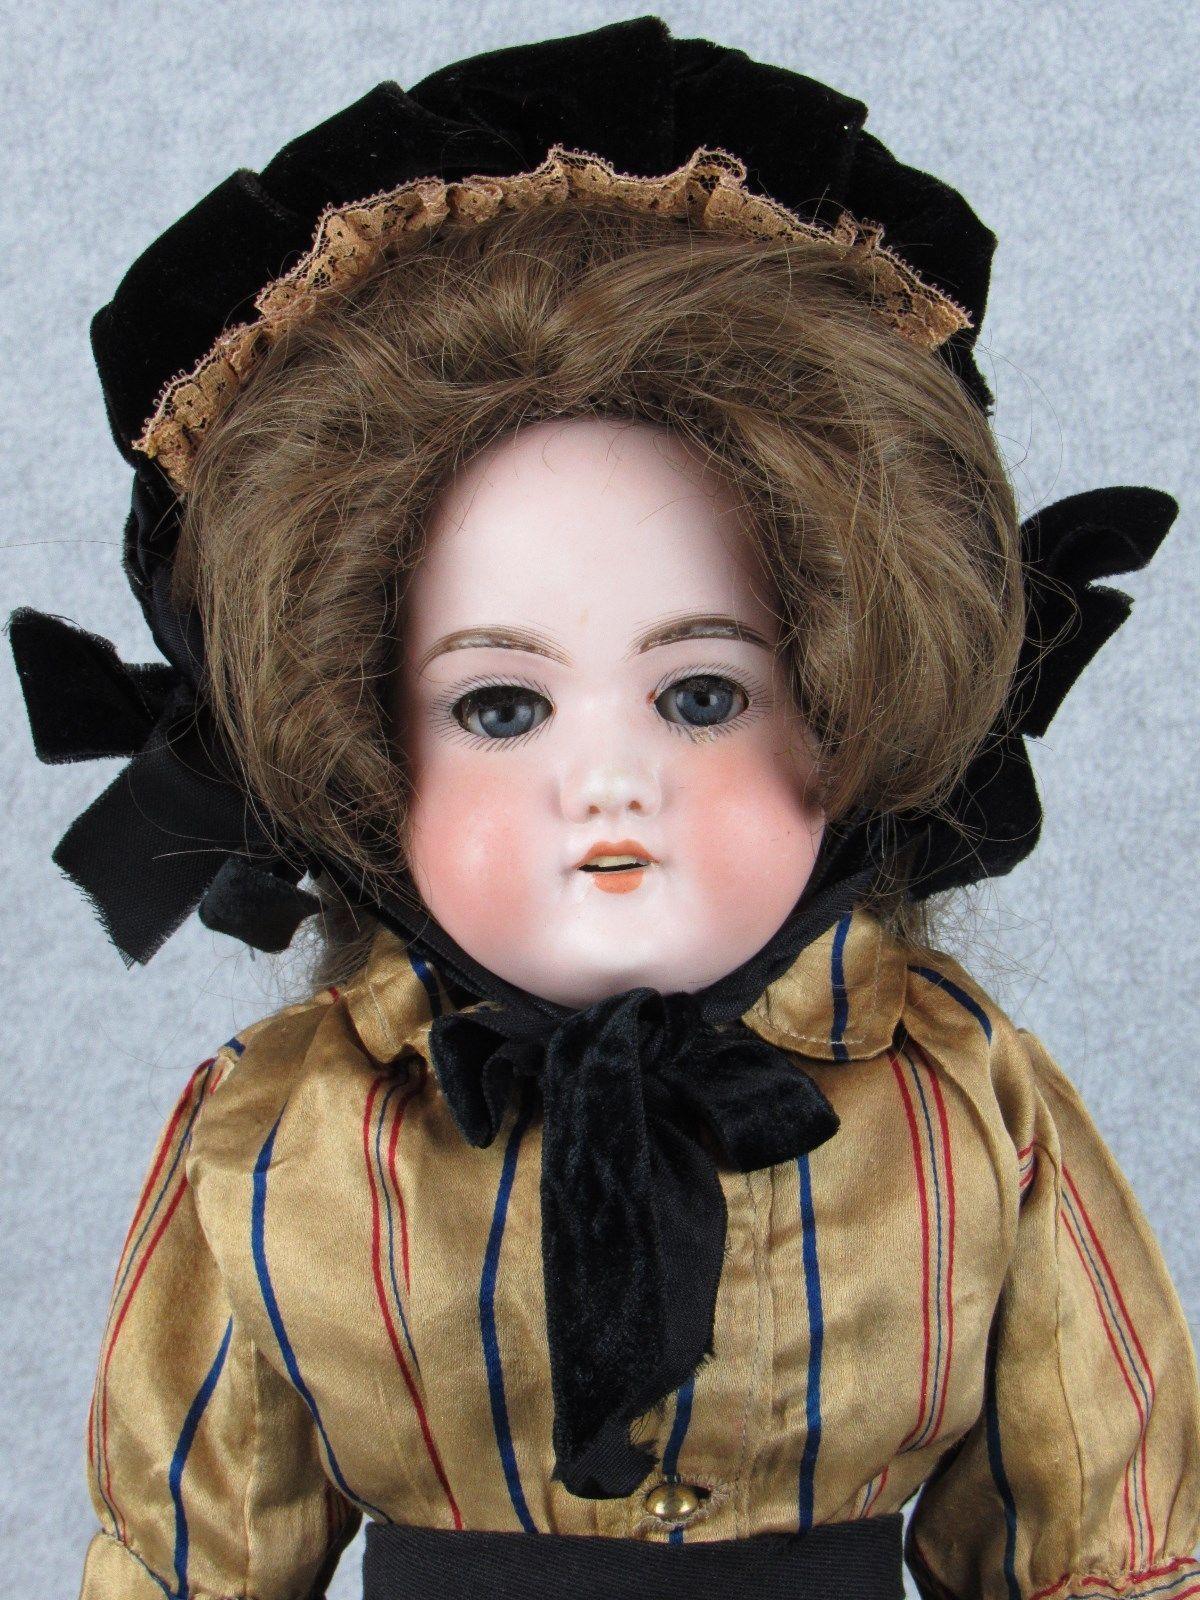 7894,01 руб. Used in Куклы и мягкие игрушки, Куклы, Антикварные (до 1930 г.)